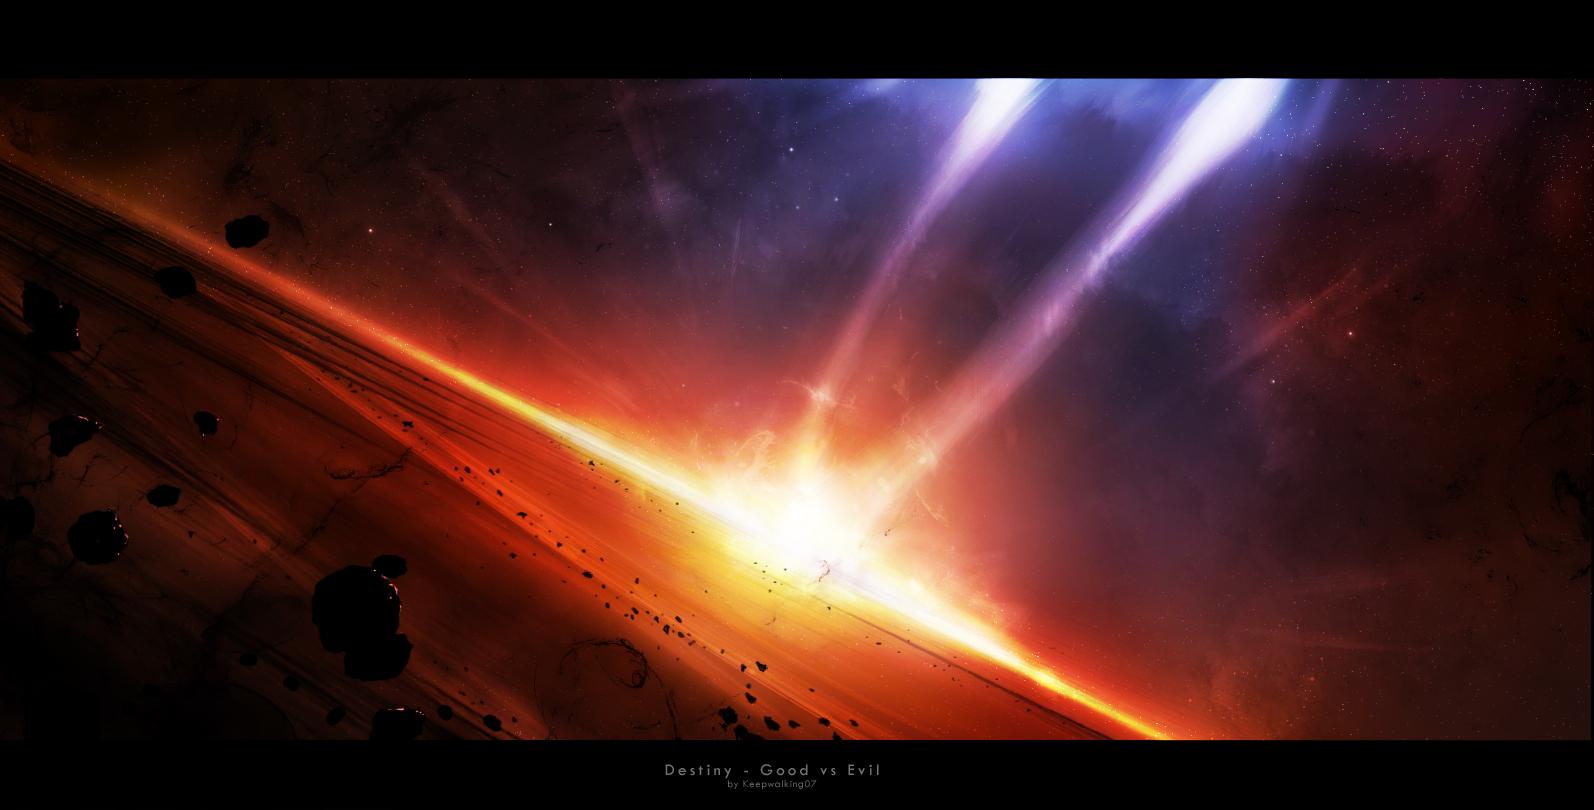 Destiny - Good vs Evil by FacundoDiaz